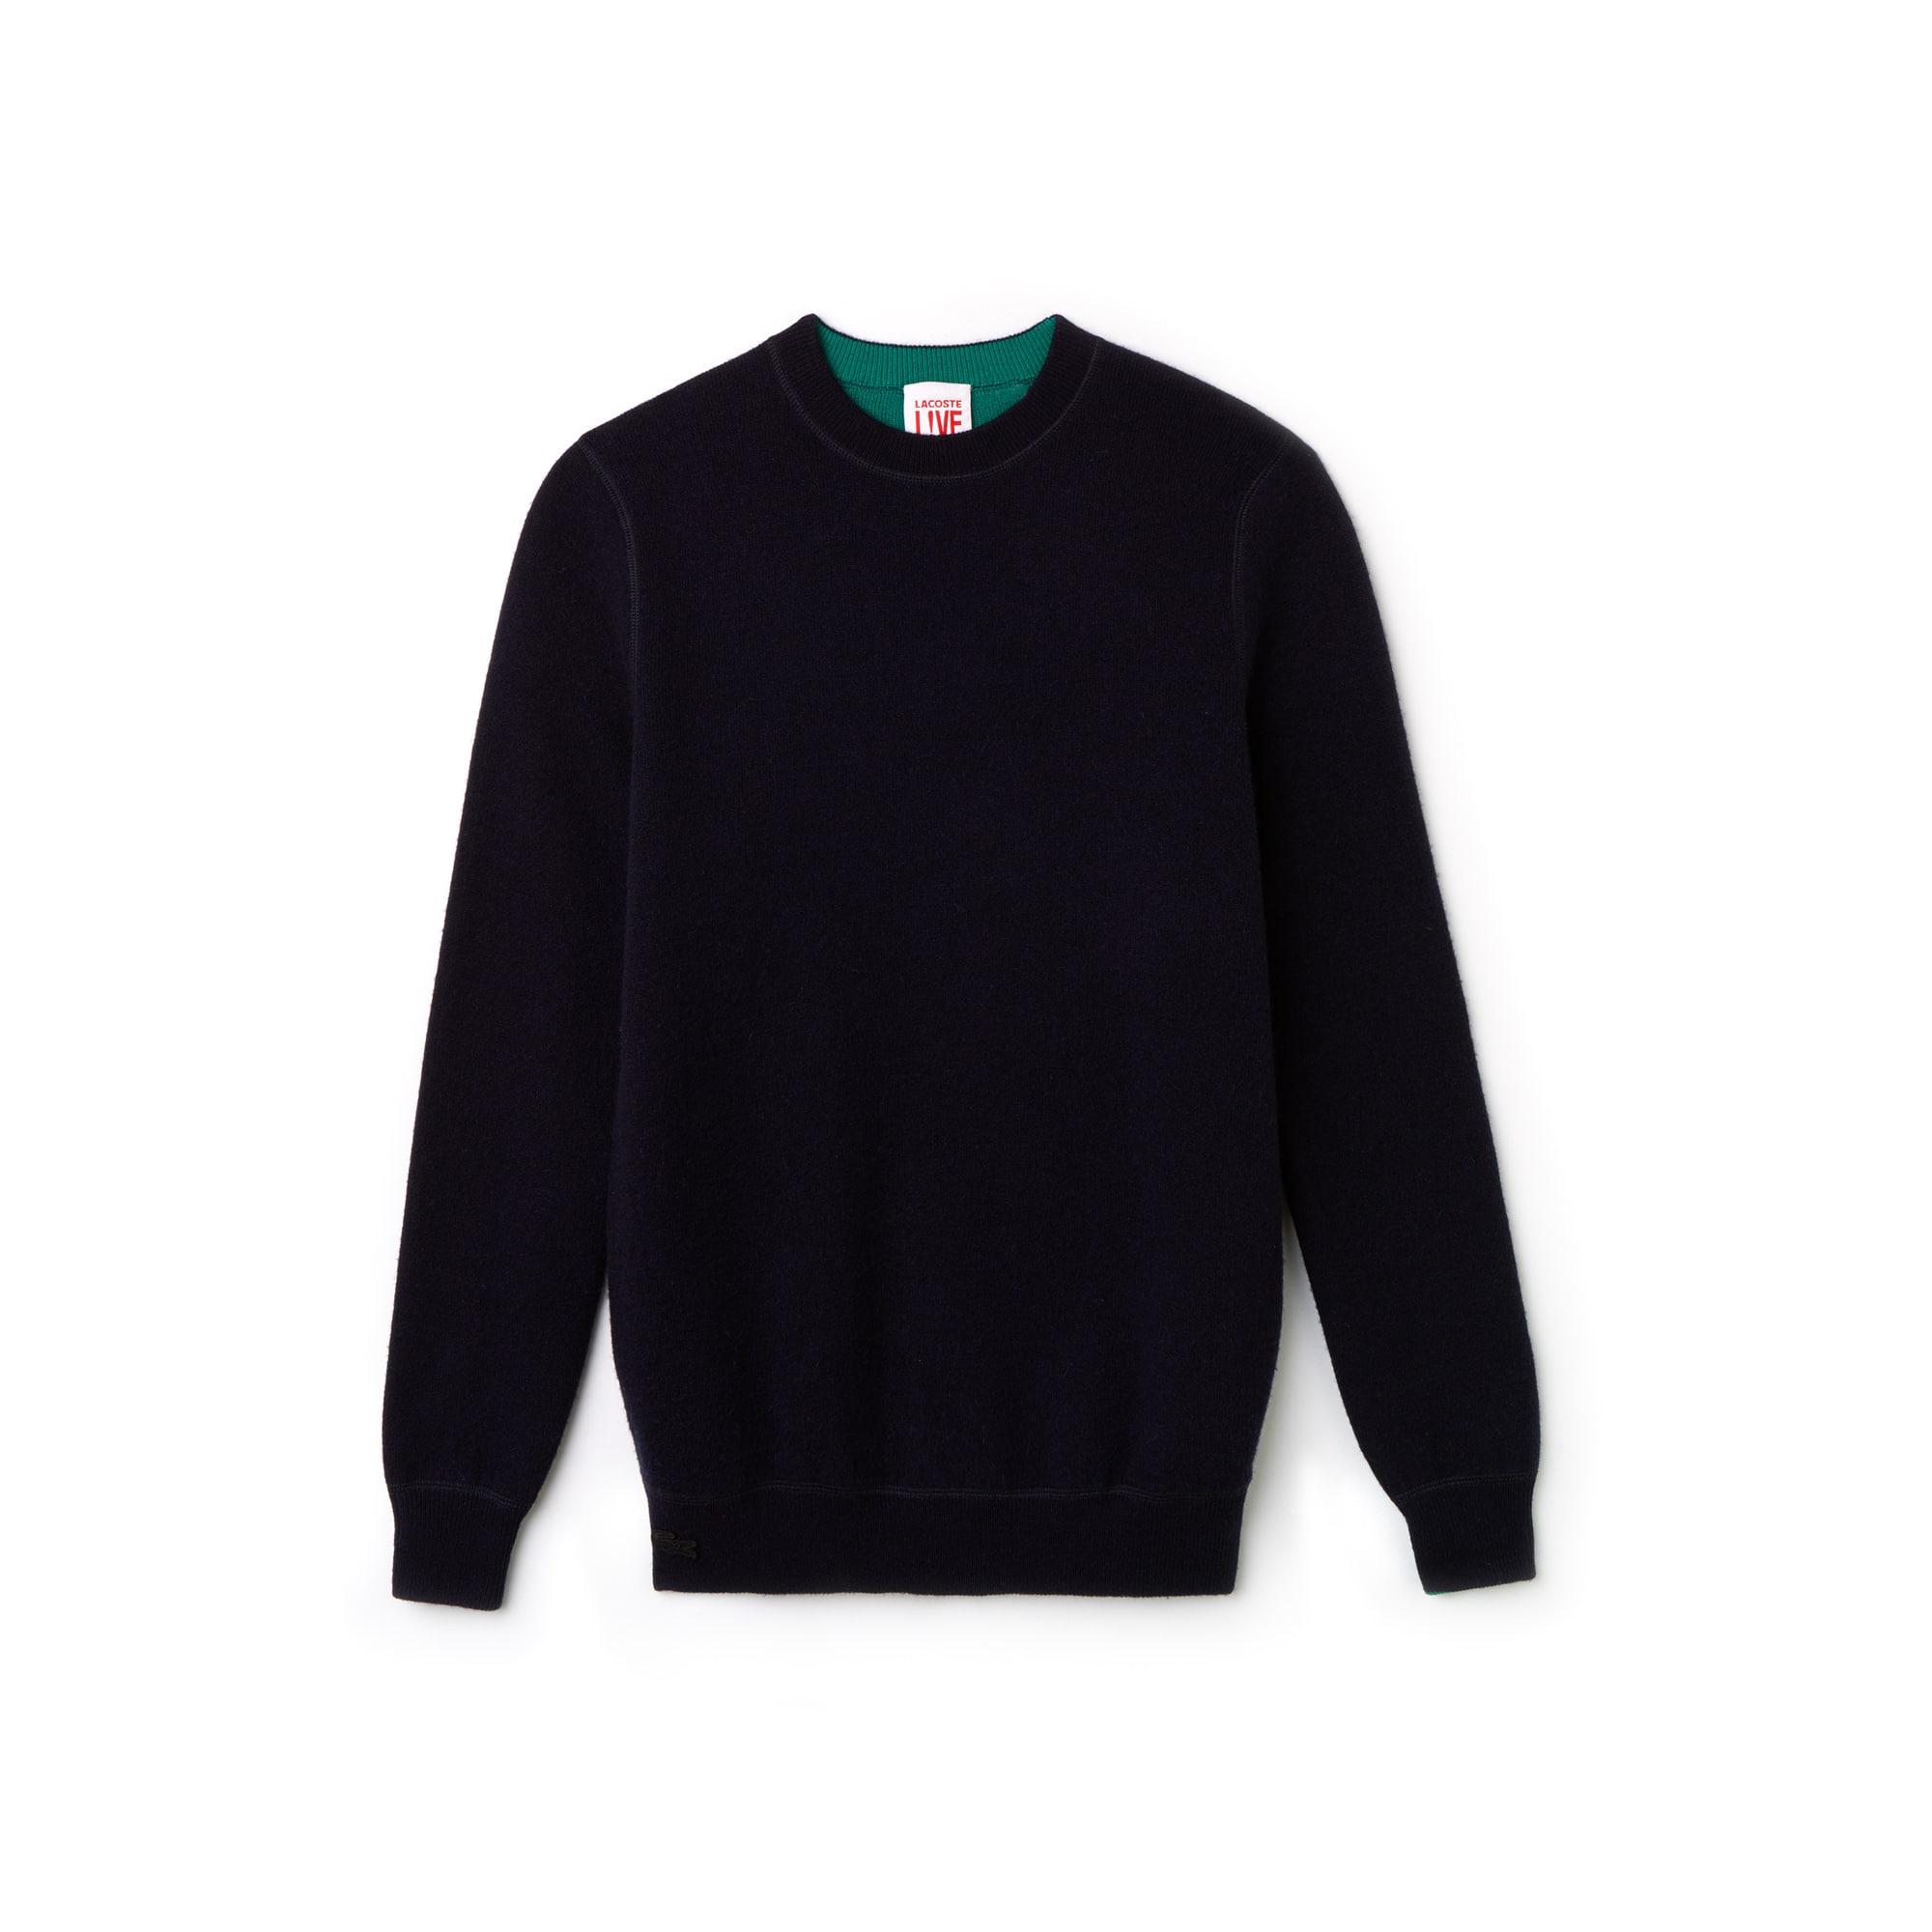 Lacoste LIVE中性版双面羊毛平纹单面针织毛衣